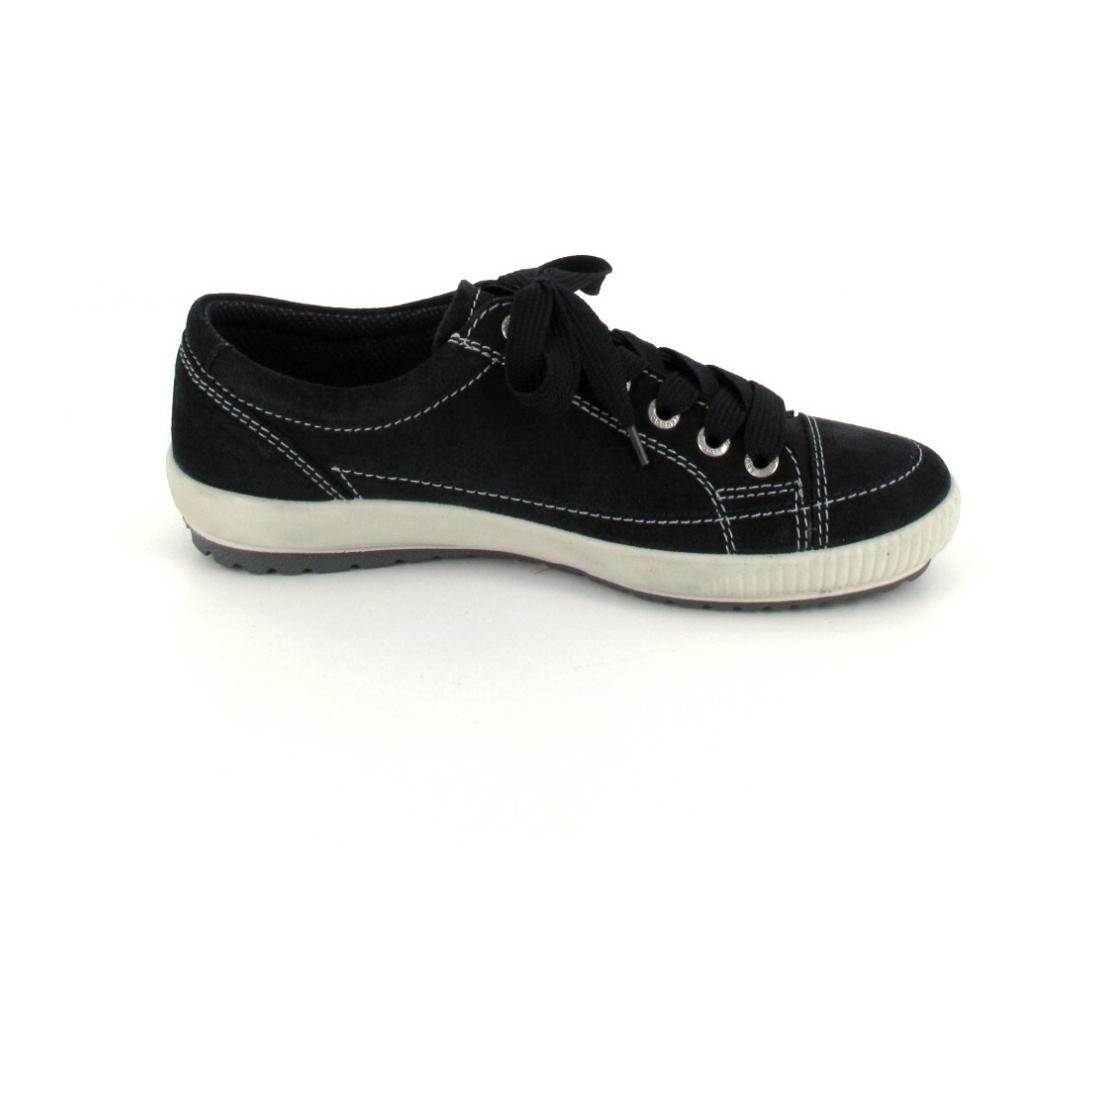 details for 100% quality best wholesaler Legero Sneaker   Schuh-Welt - Wo Markenschuhe günstig sind